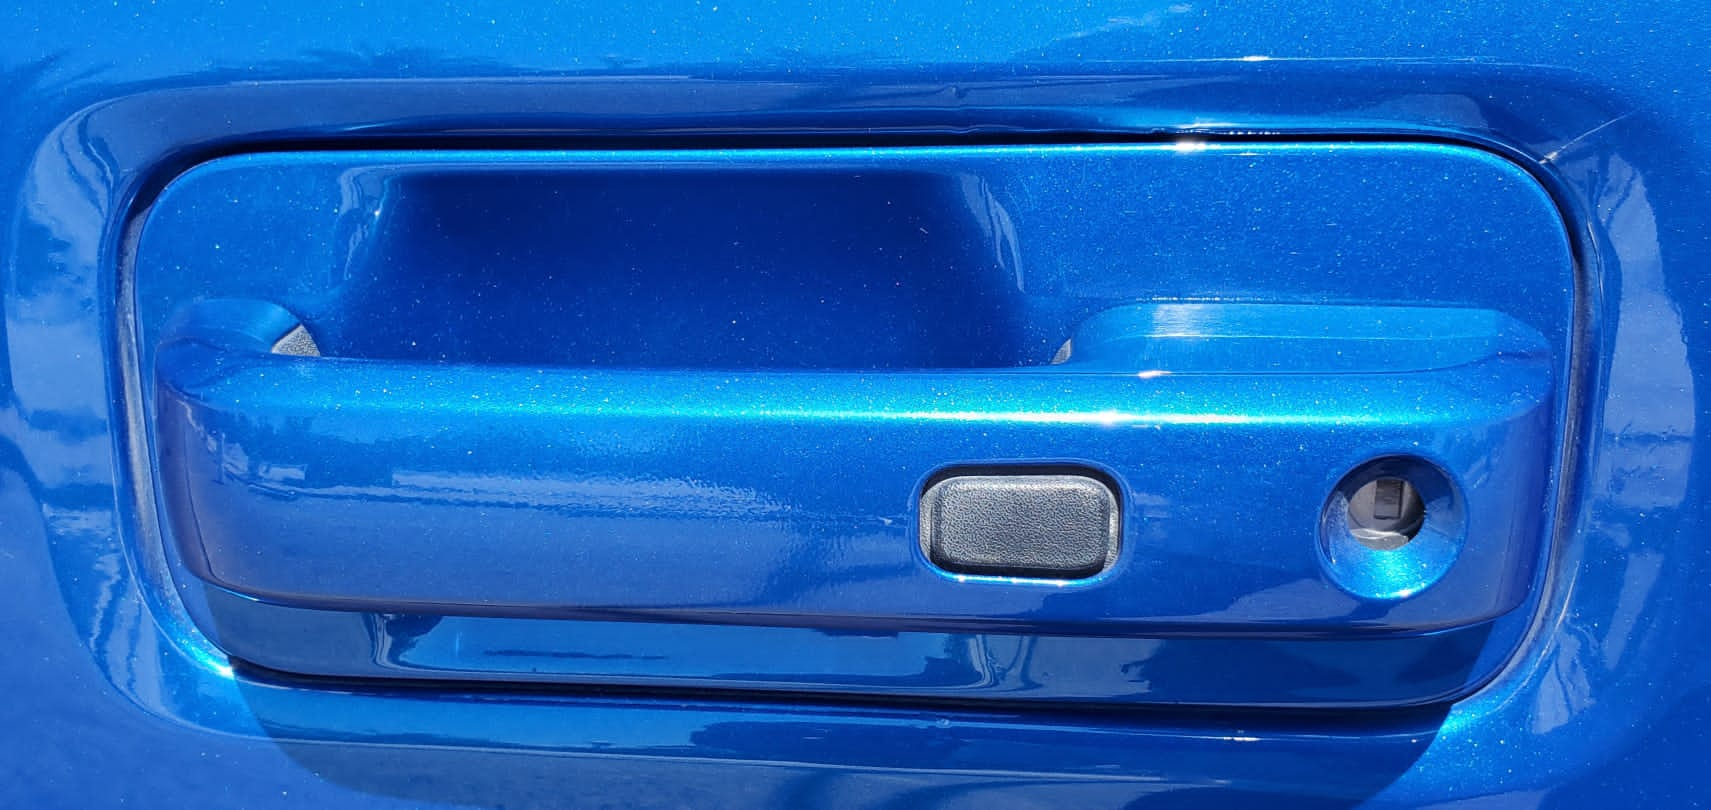 Ford F-150 Lariat 2015